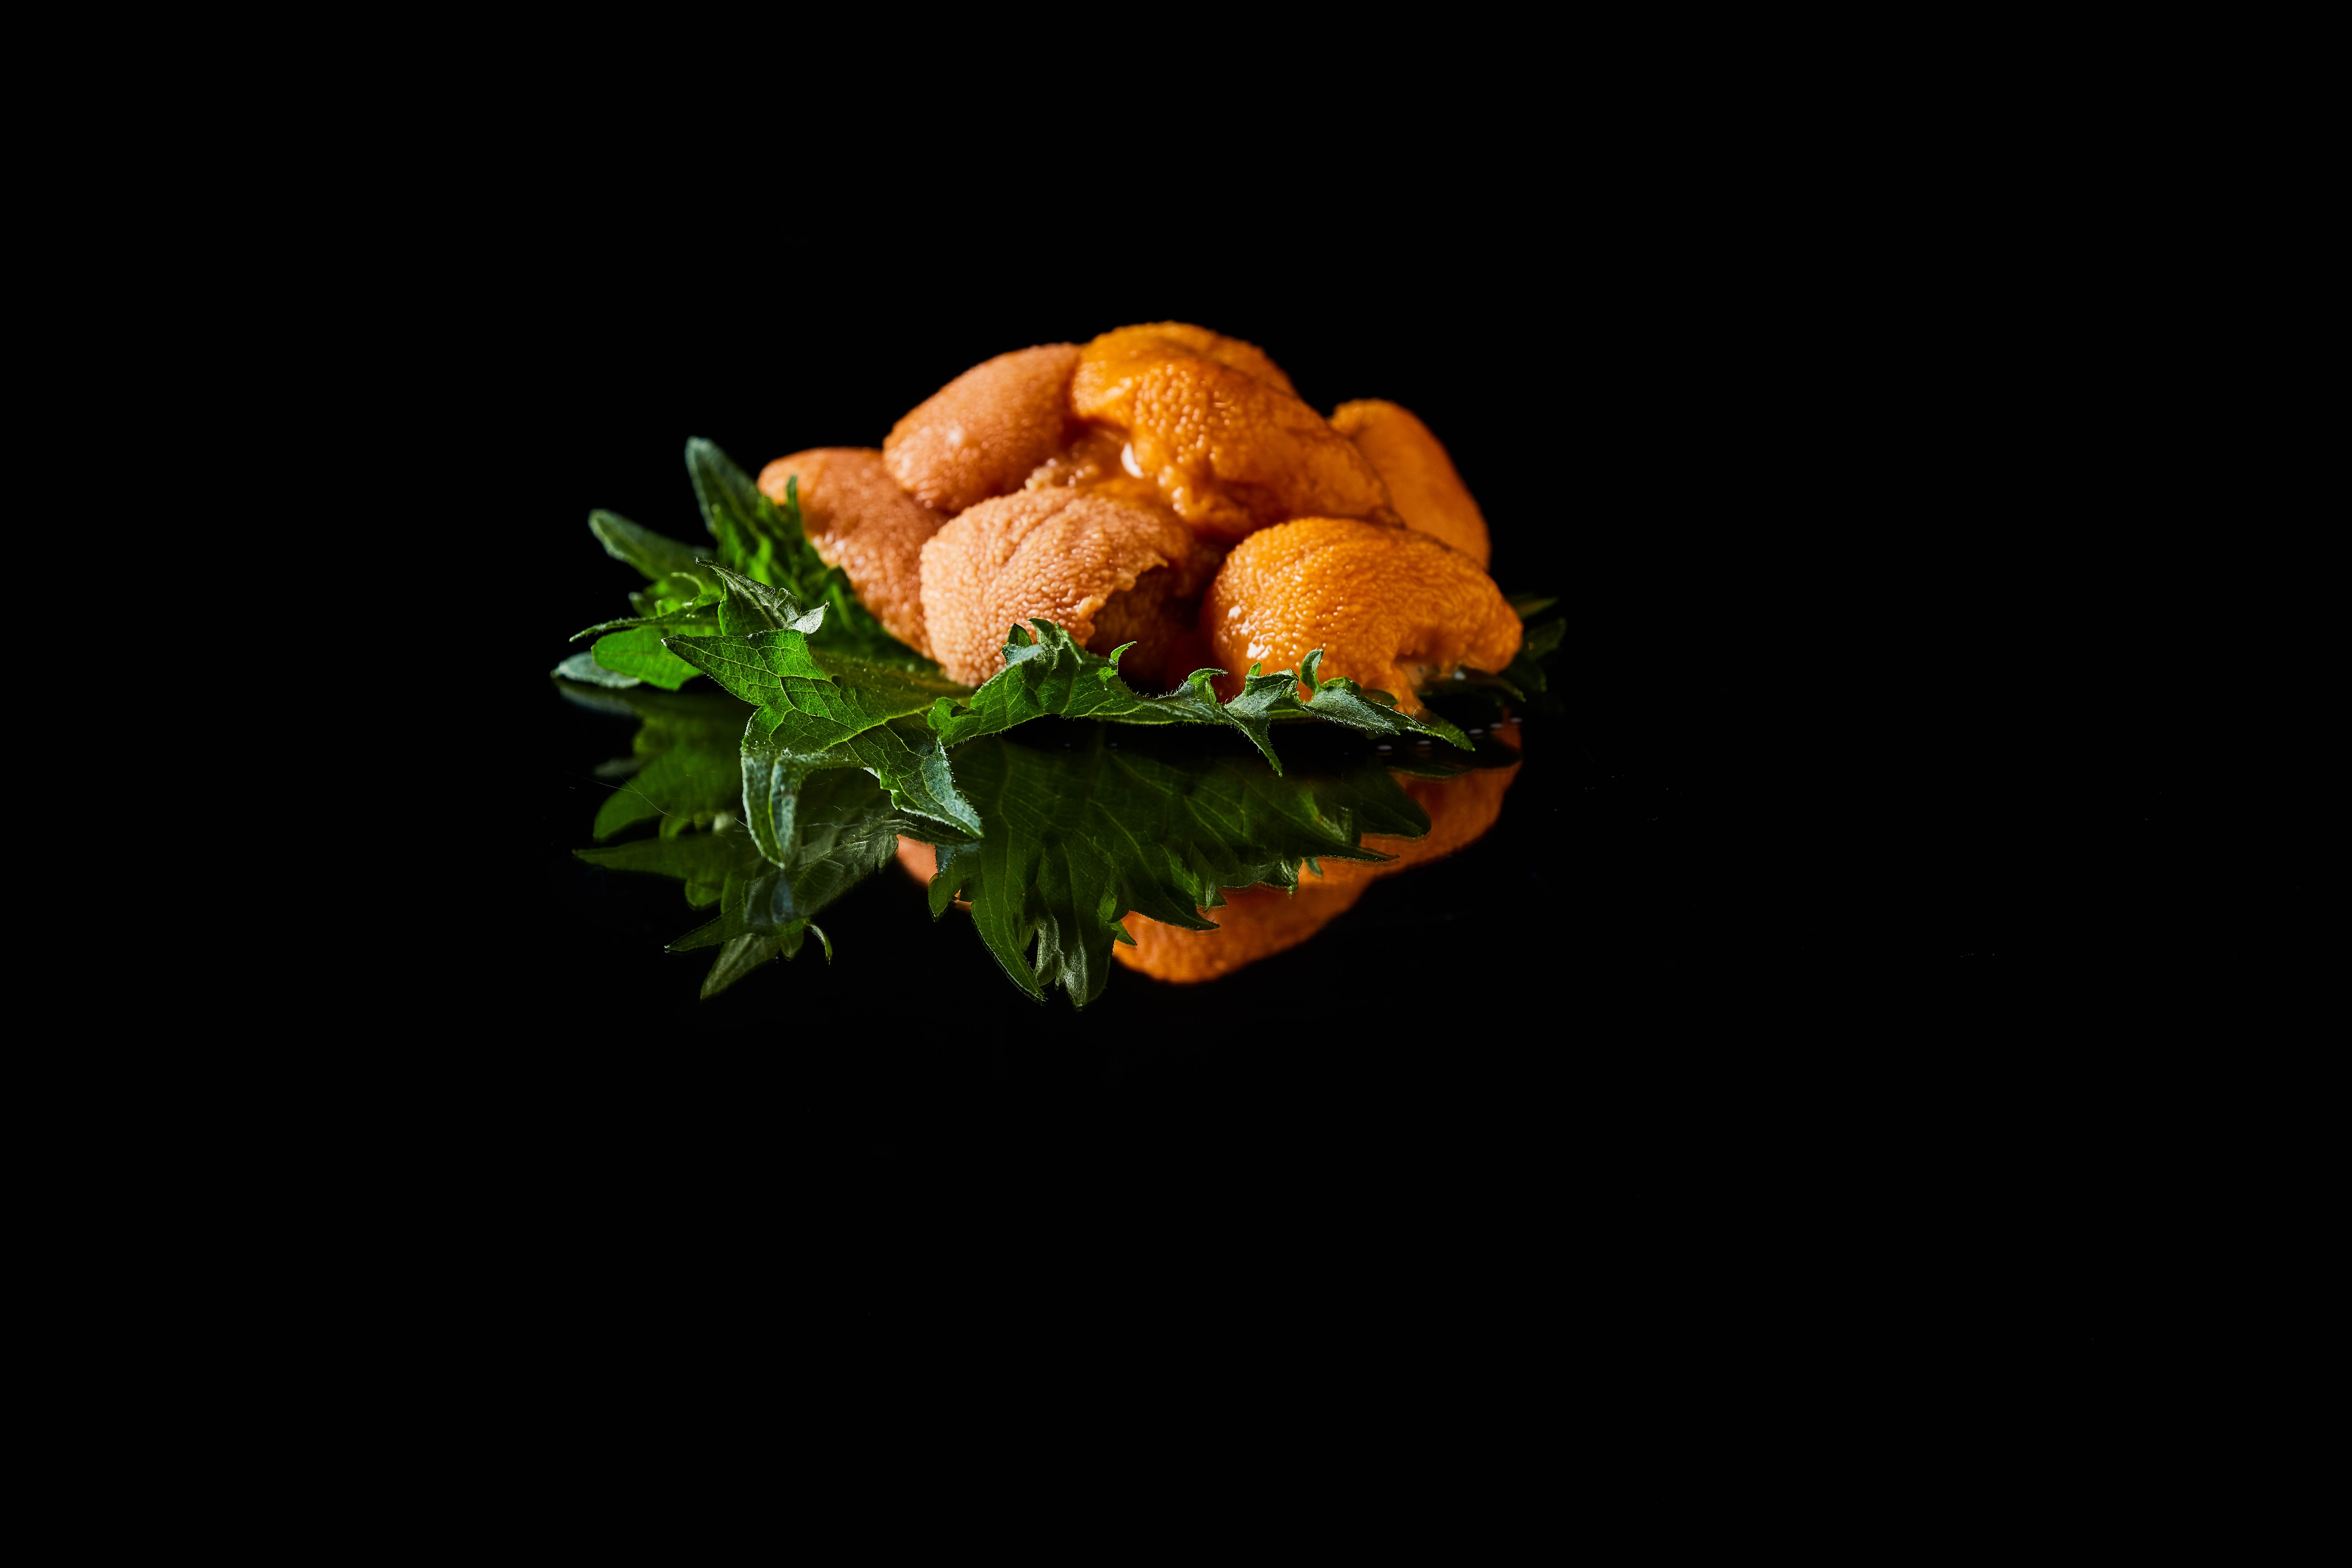 Honjo 食物擺盤精美,讓人耳目一新。(圖片:Honjo )